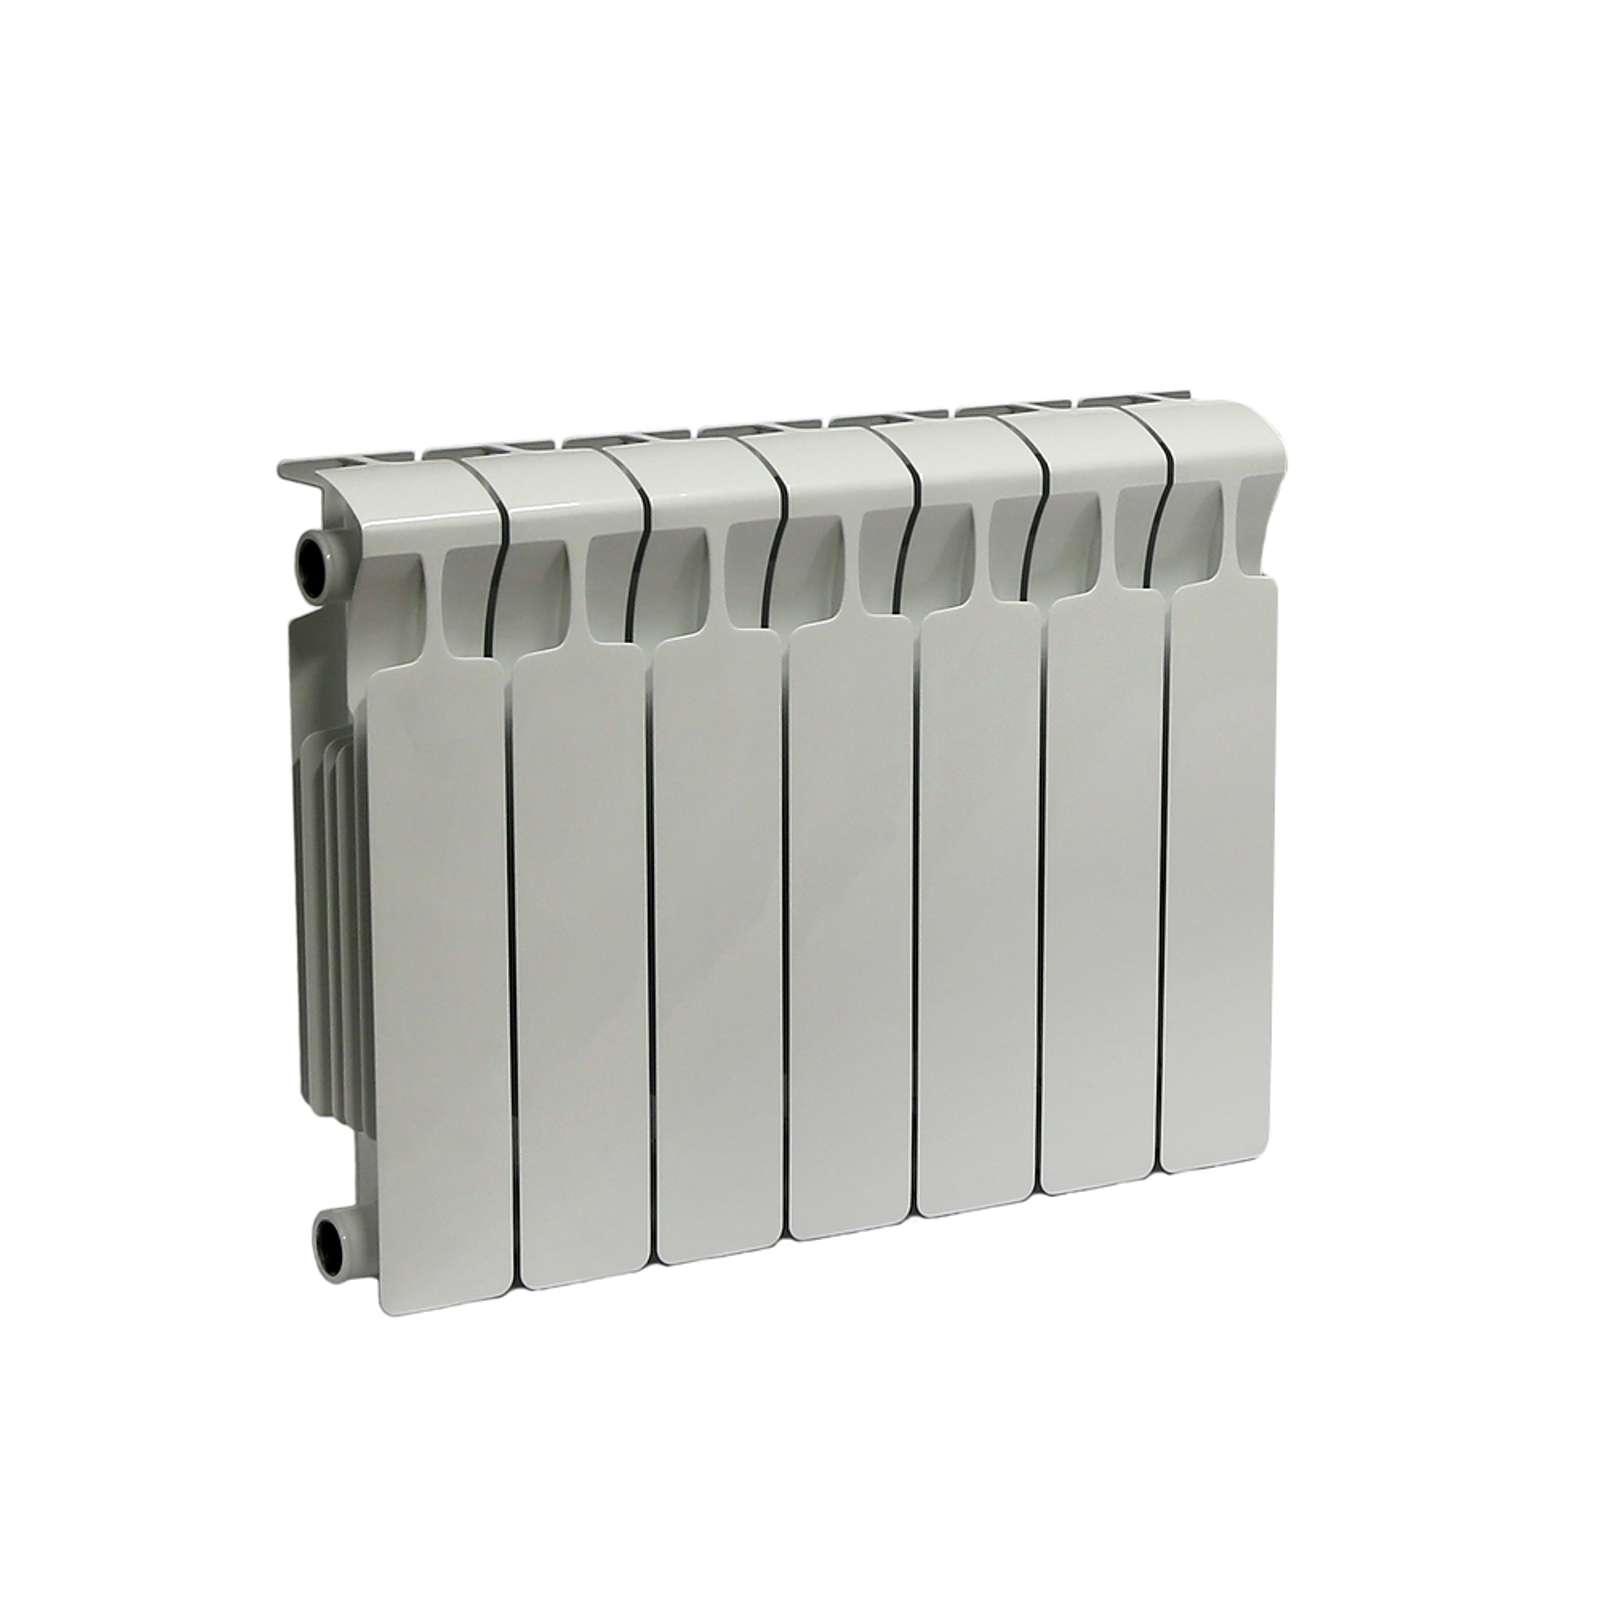 Радиатор биметаллический RIFAR Monolit 500 7 секций НП прав (MVR)